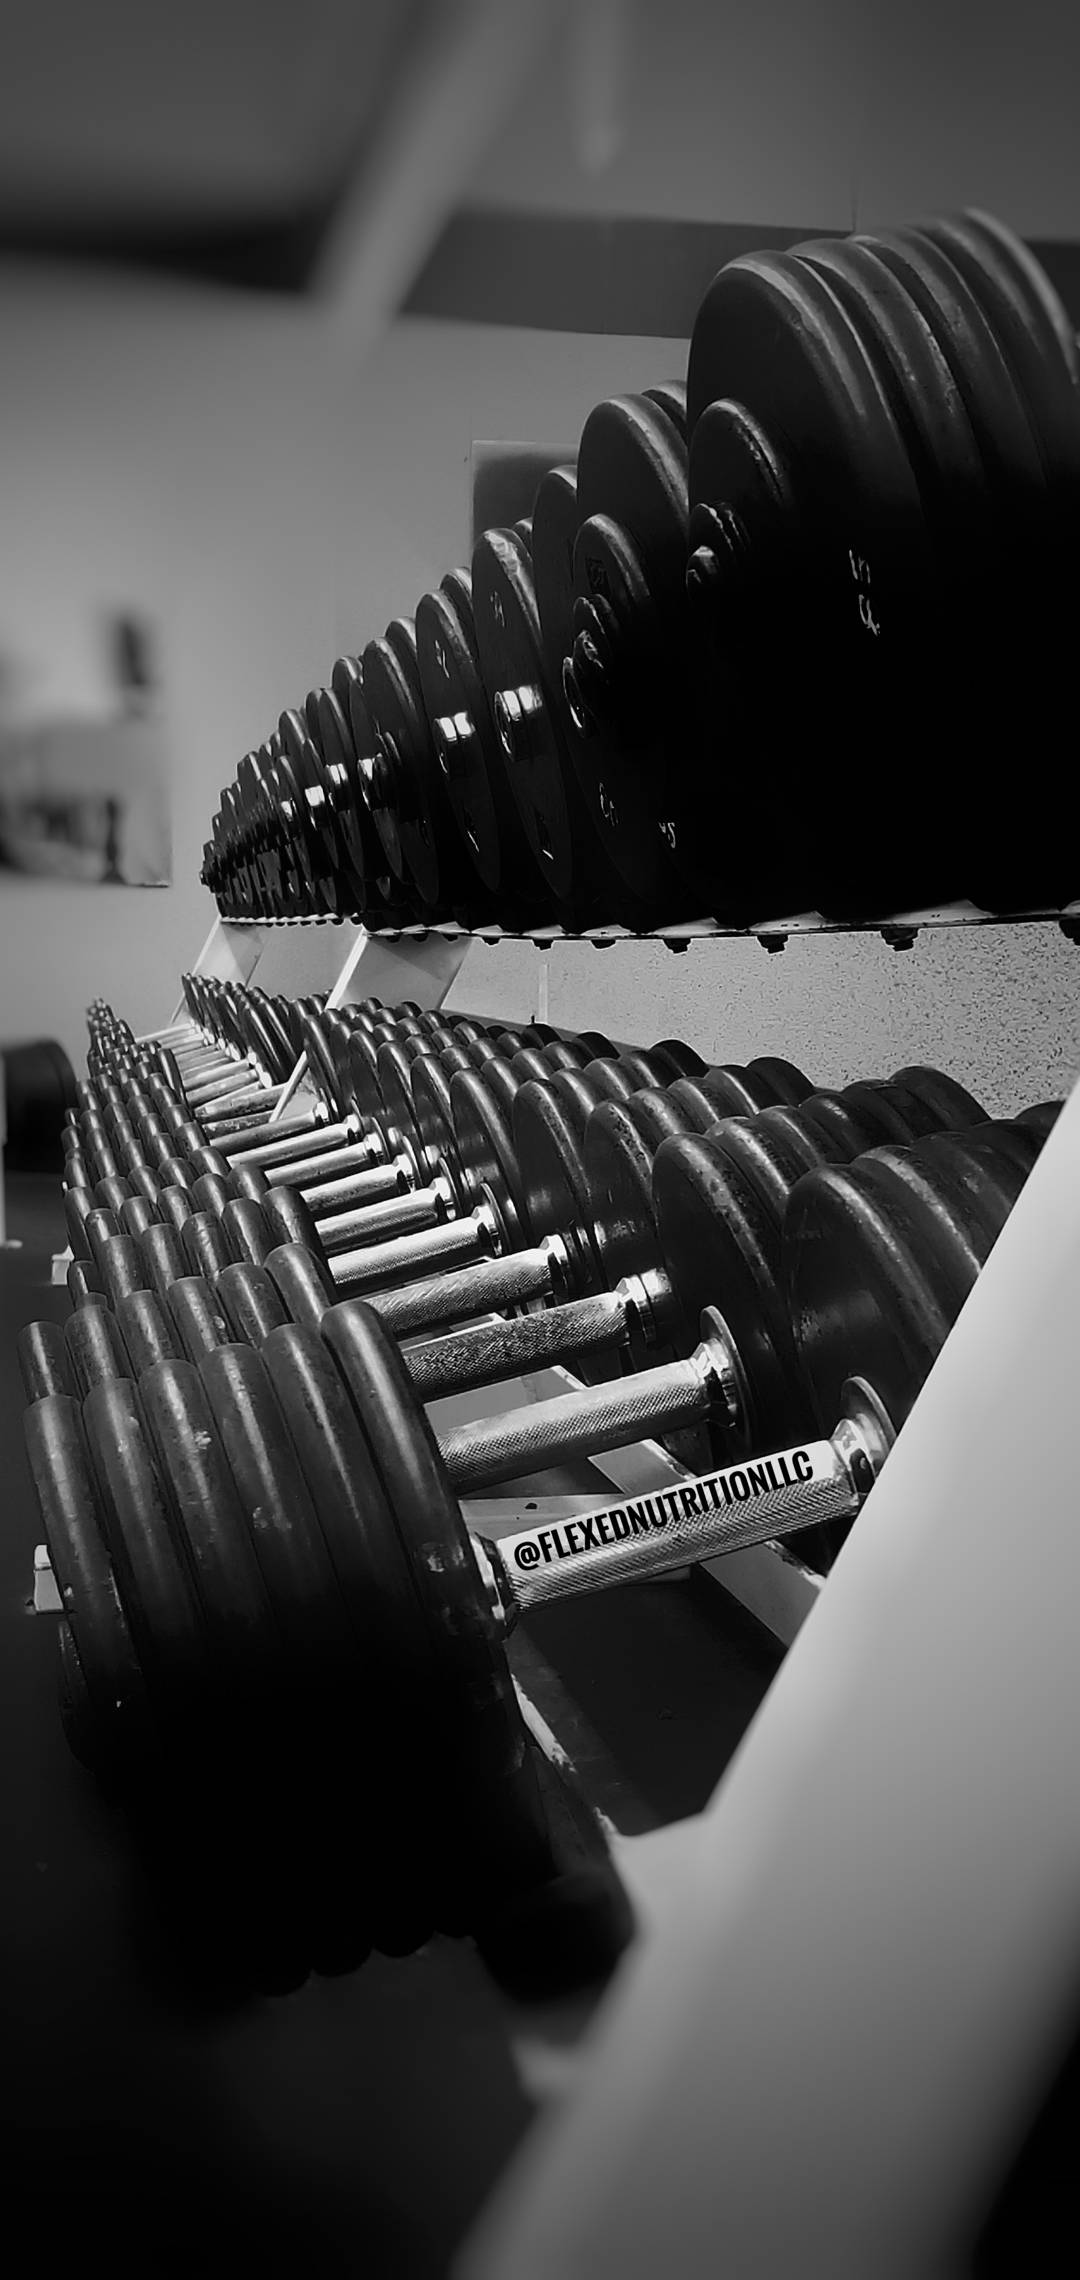 Gym_weights-8cc8dcac-f981-4386-bc2e-b4673555452f-1-min